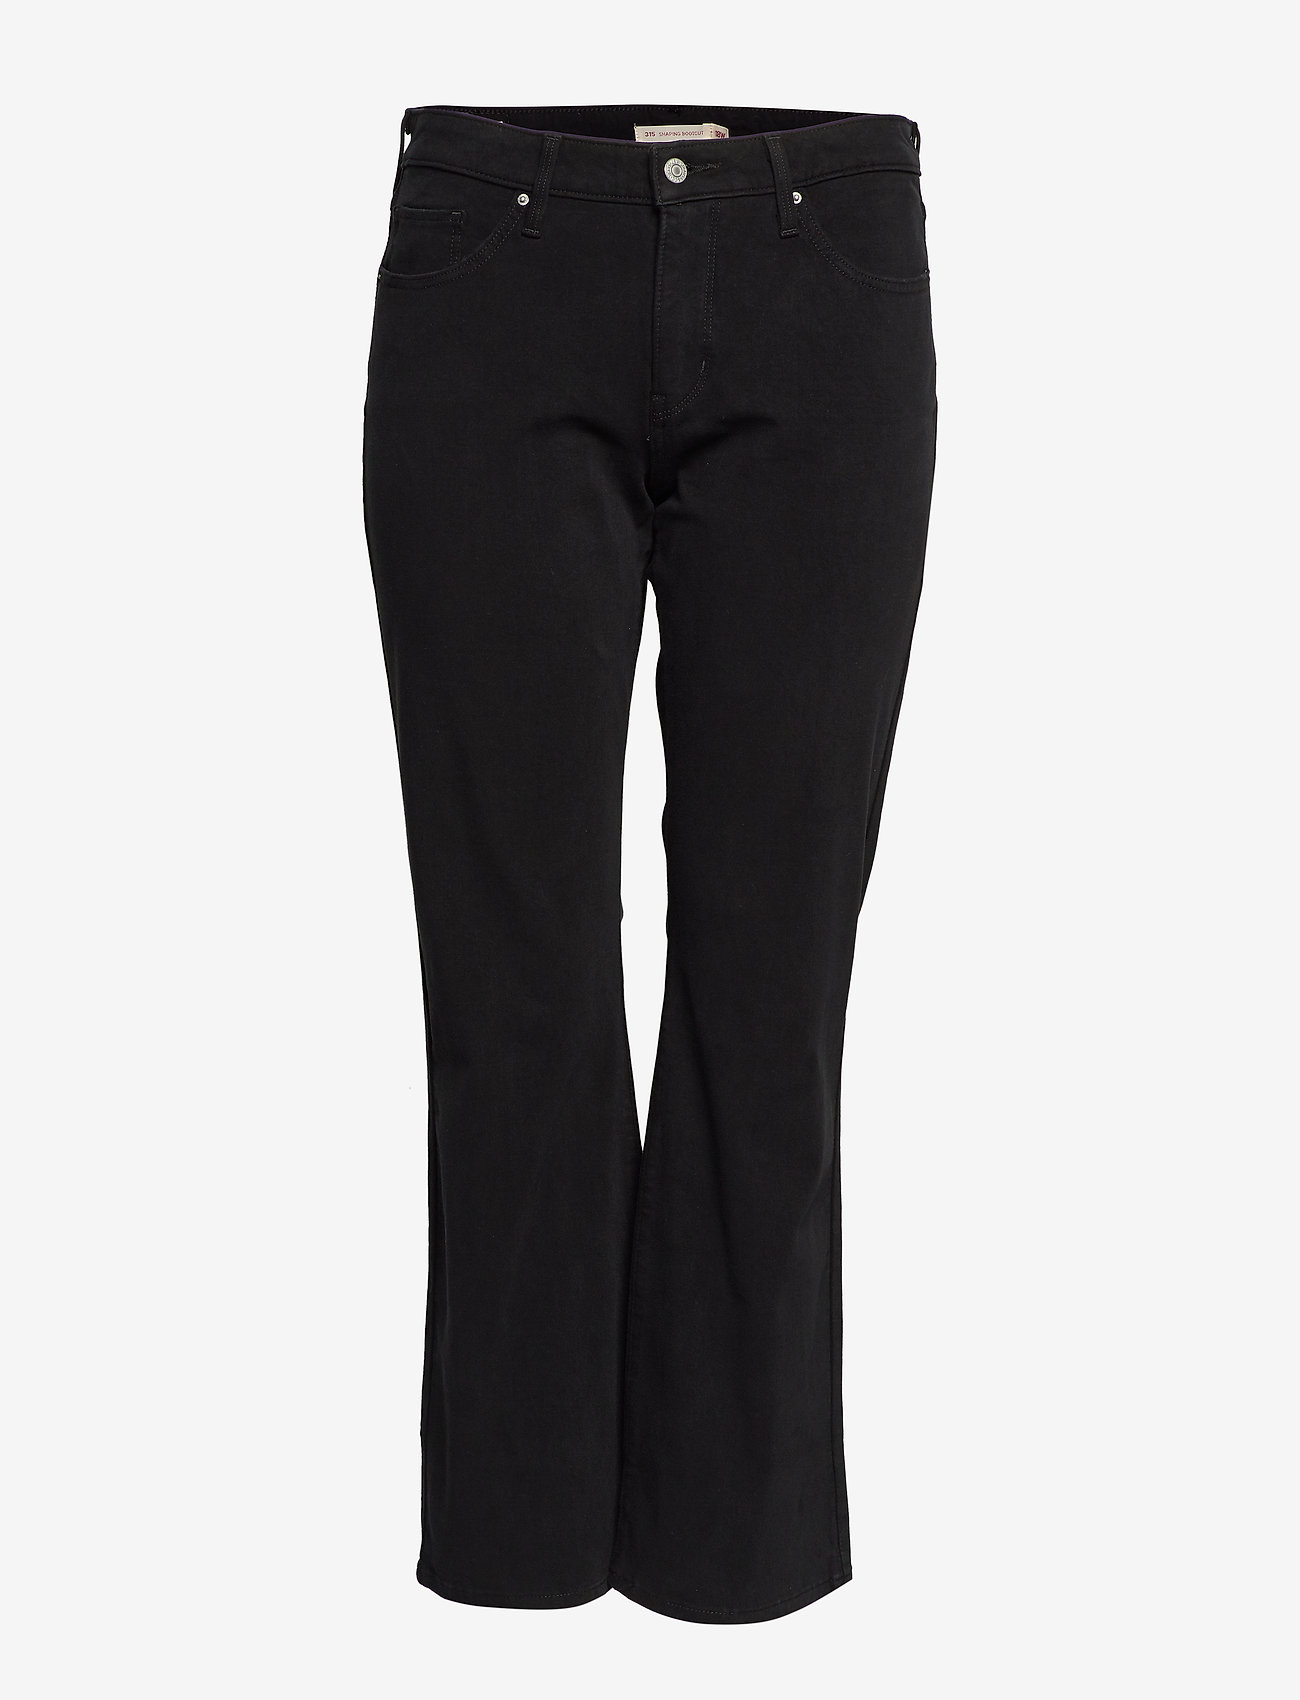 Levi's Plus Size - 315 PL SHAPING BOOT 4X STRETCH - straight leg trousers - blacks - 0